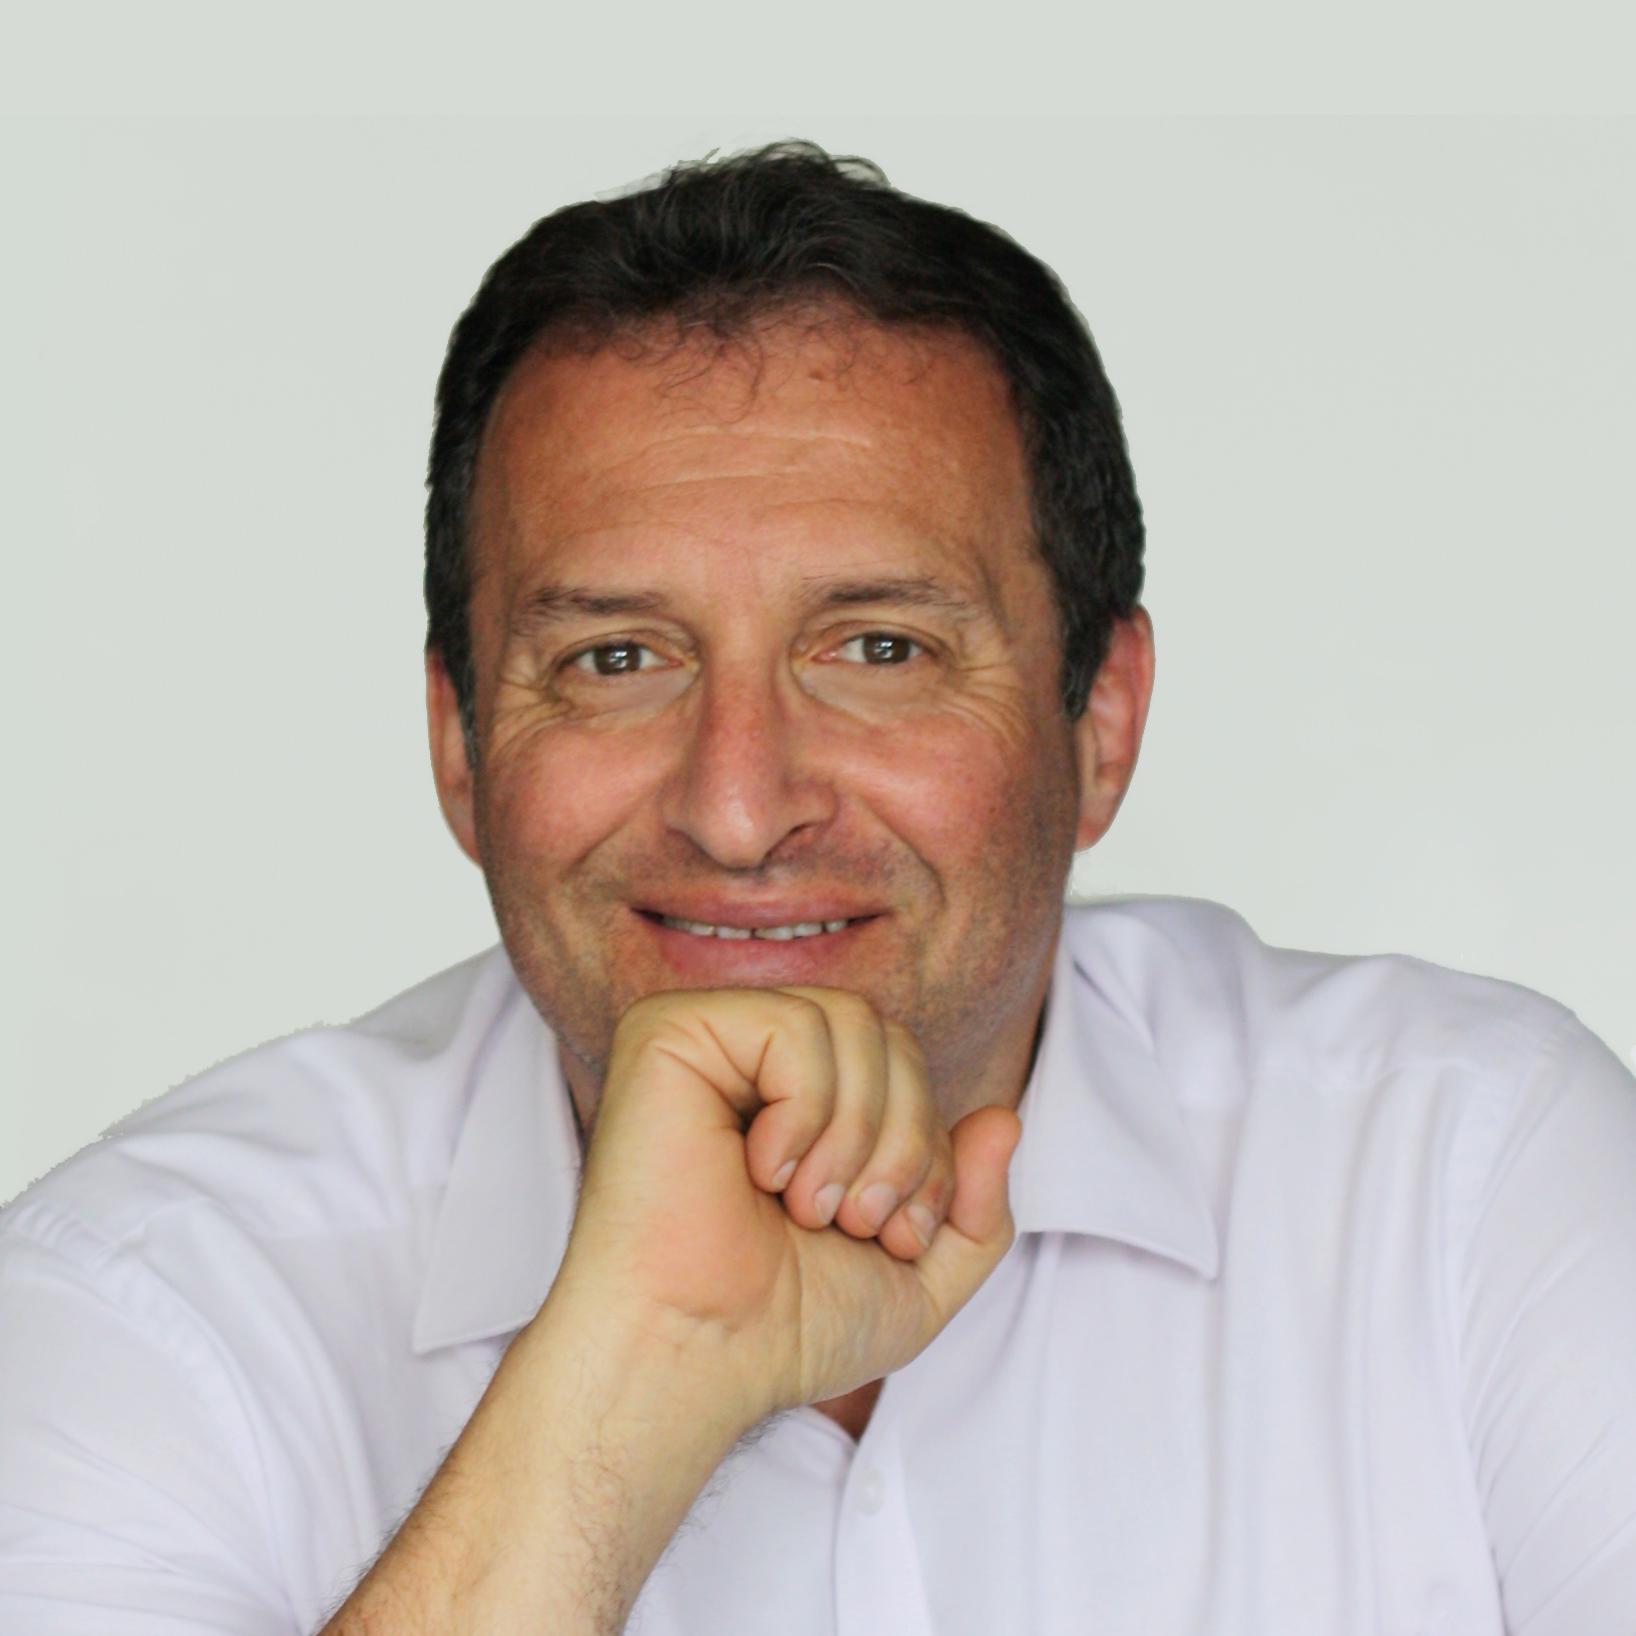 Marc Trup